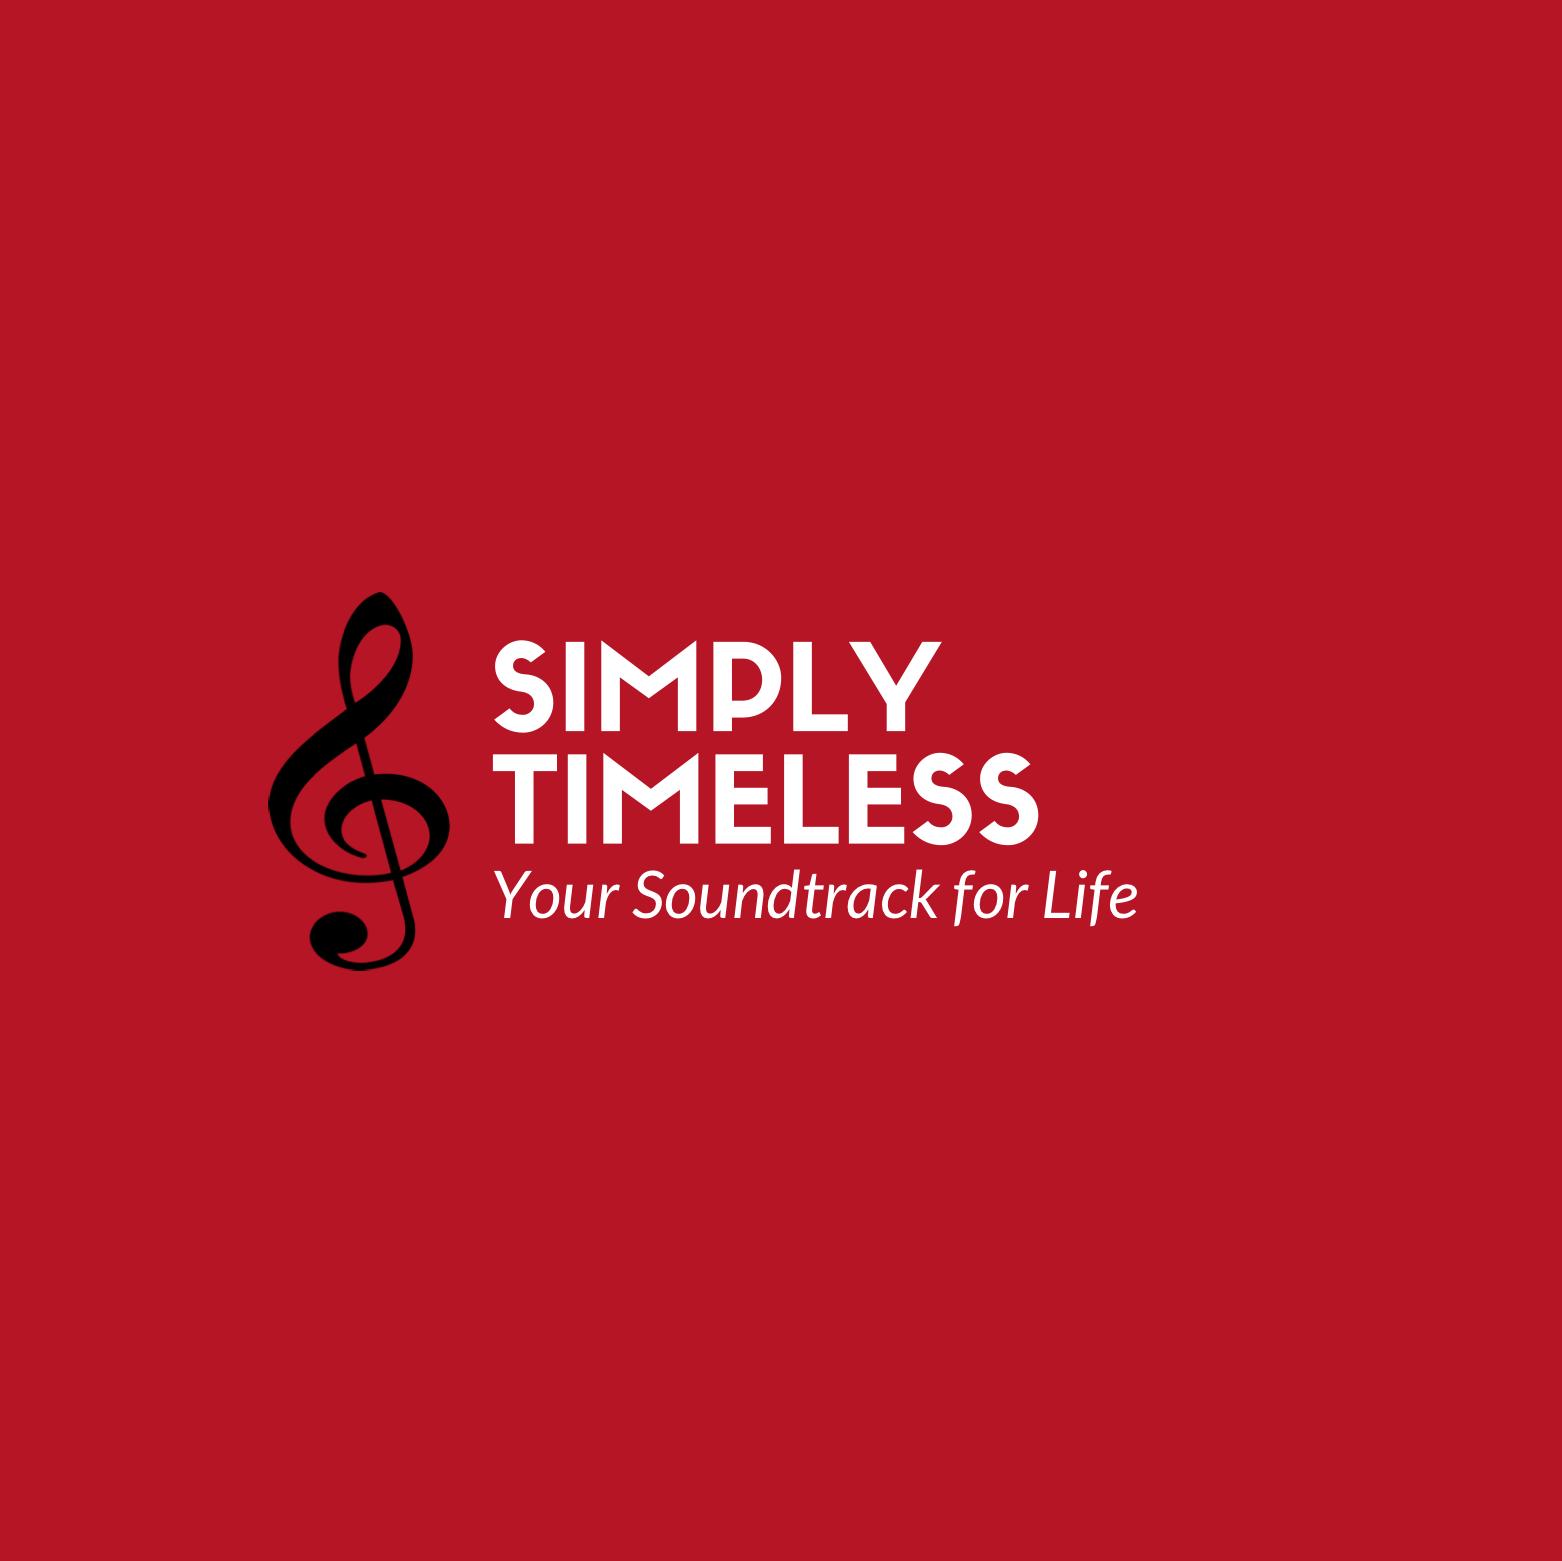 Simply Timeless